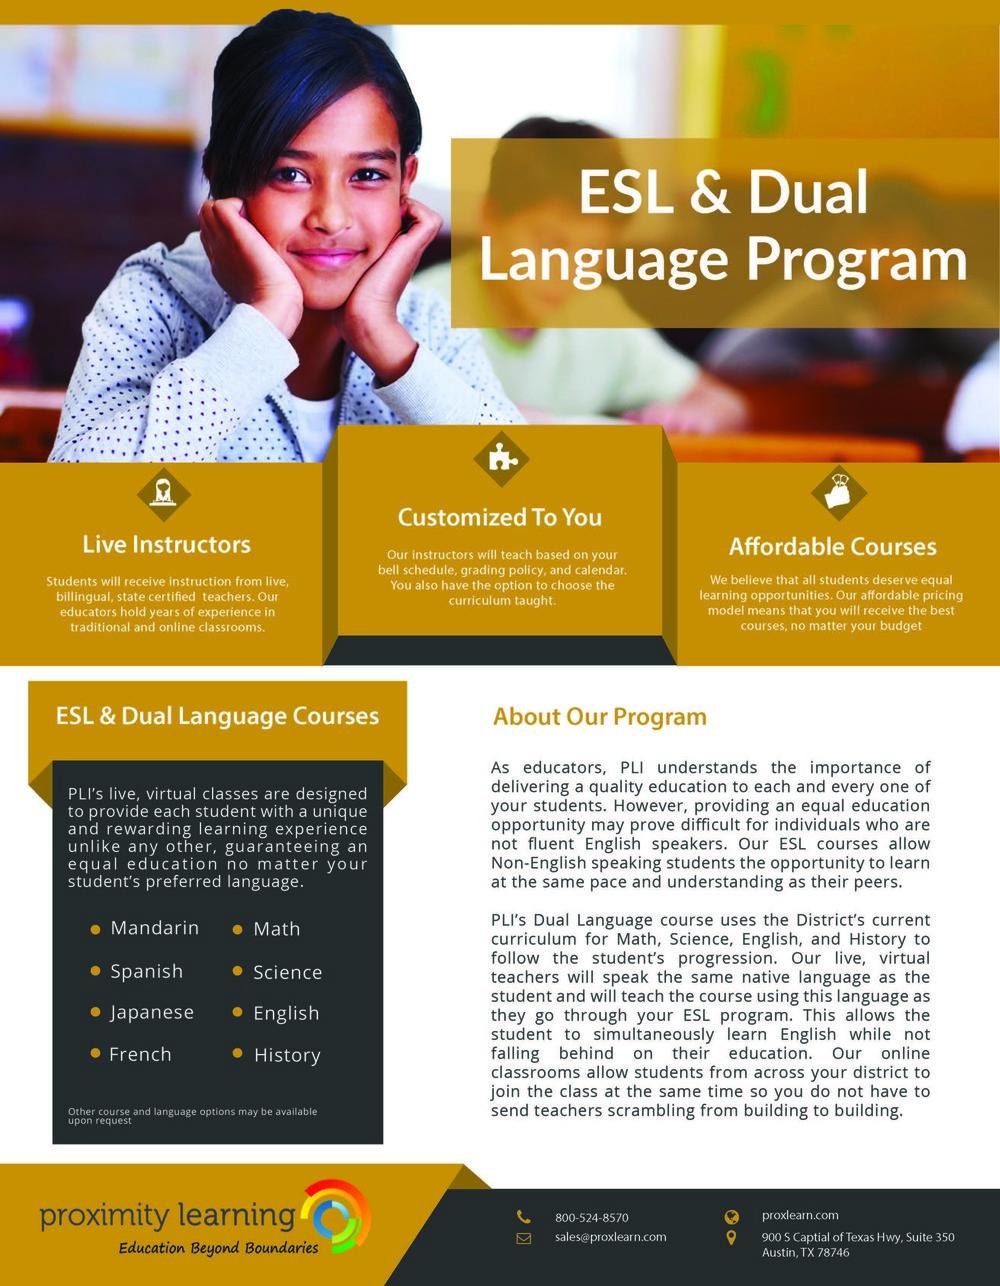 ESL & Dual Language